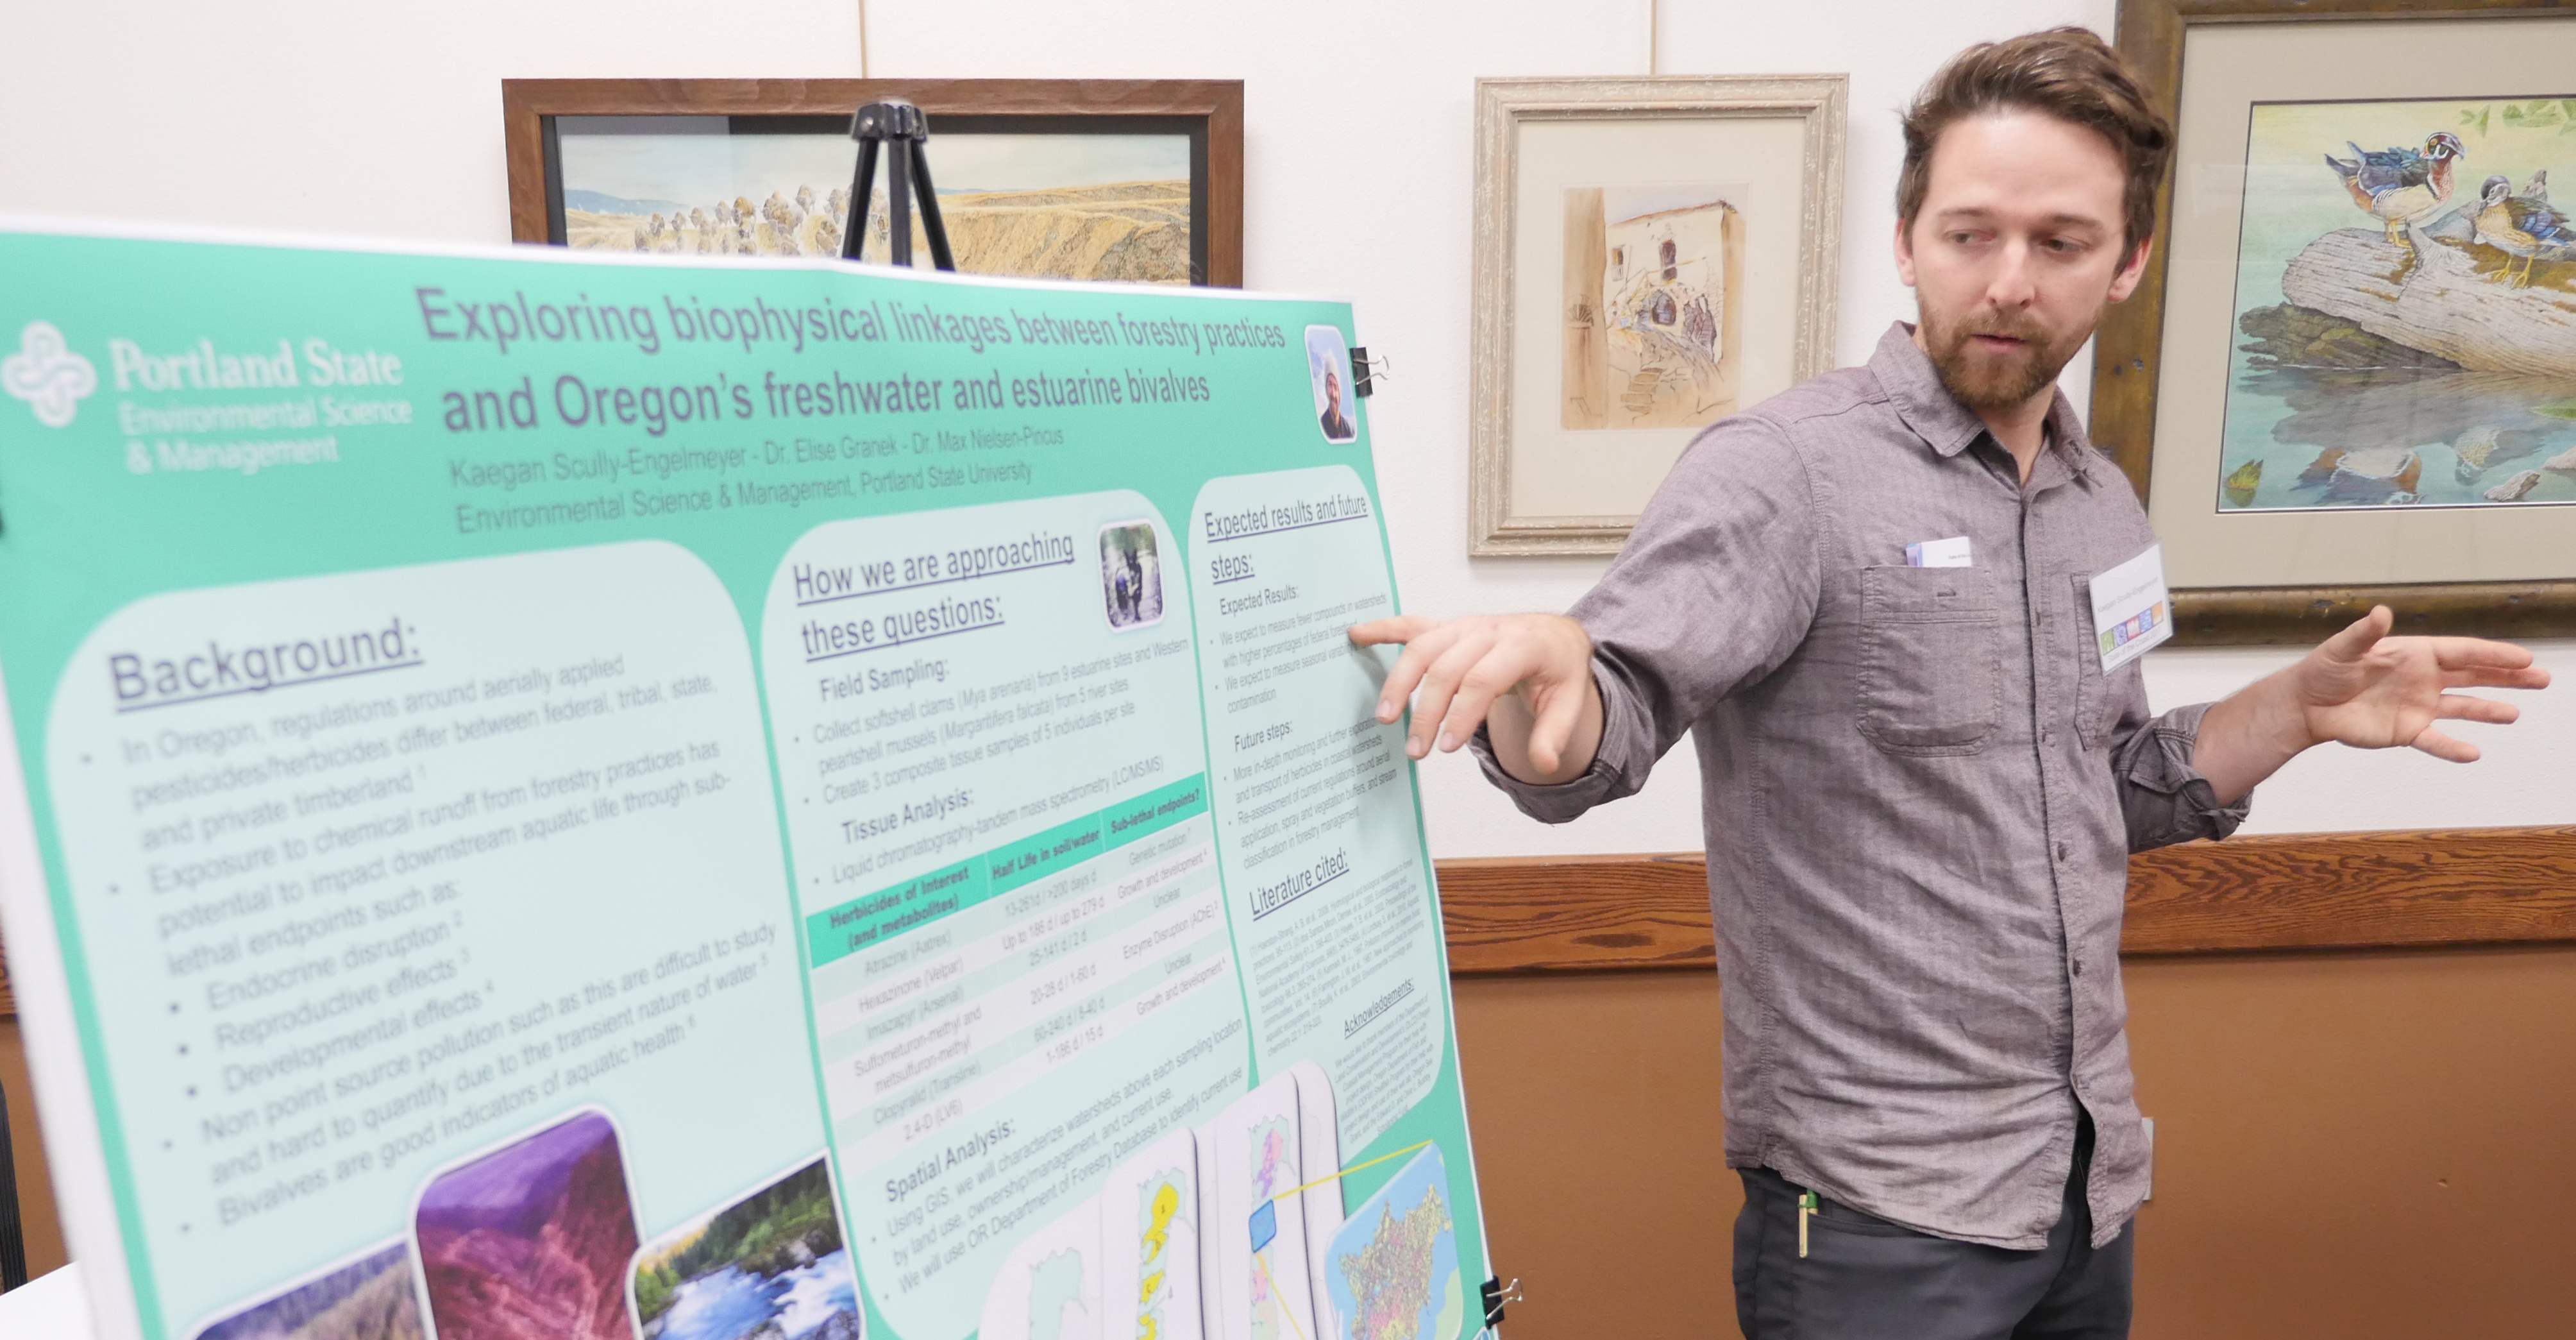 Kaegan Scully-Engelmeyer explains his research